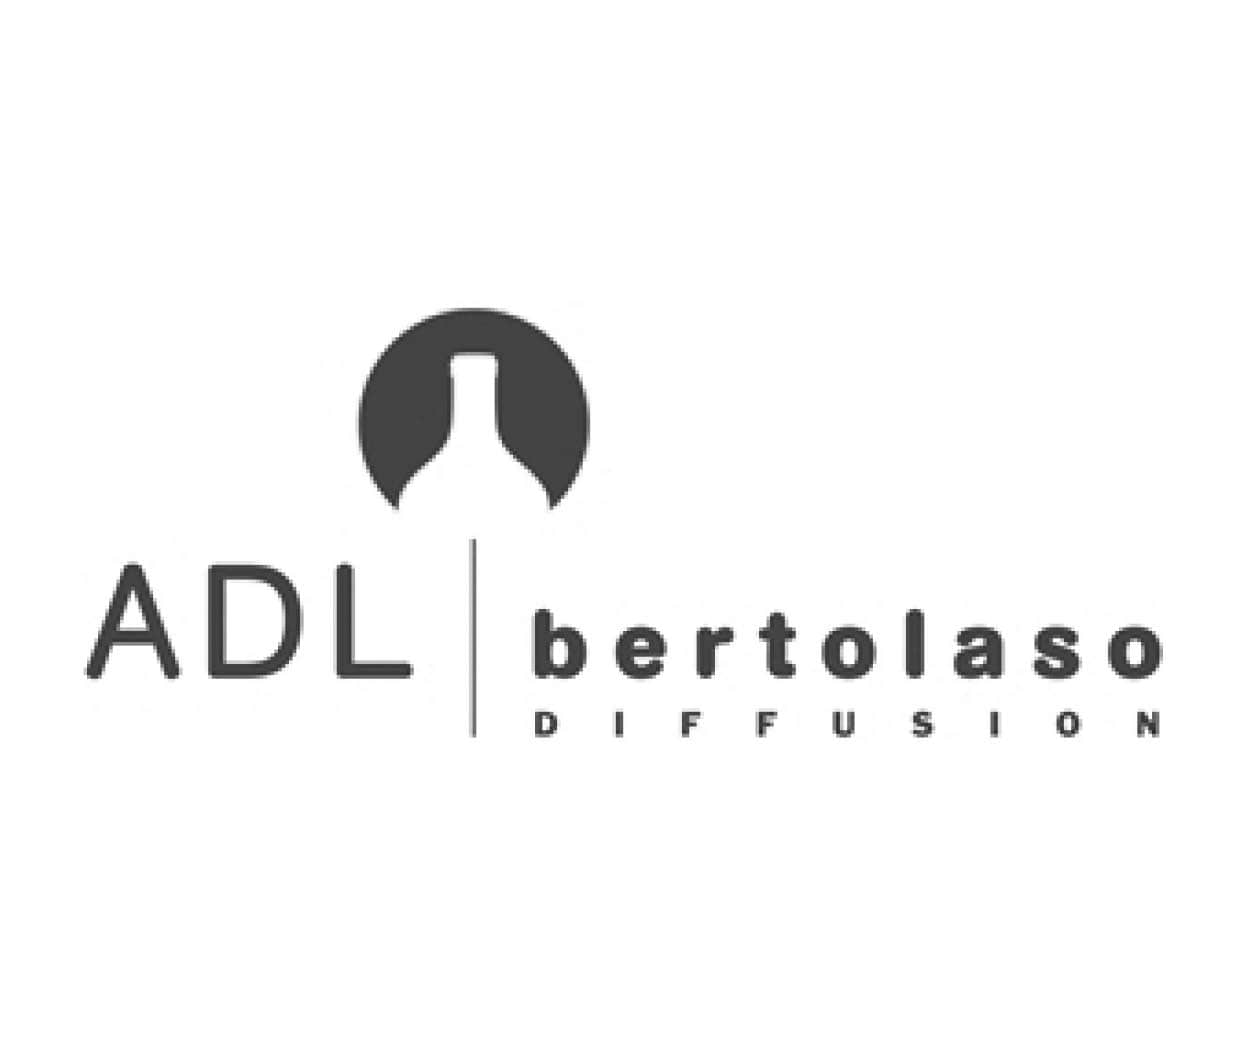 ADL Bertolaso